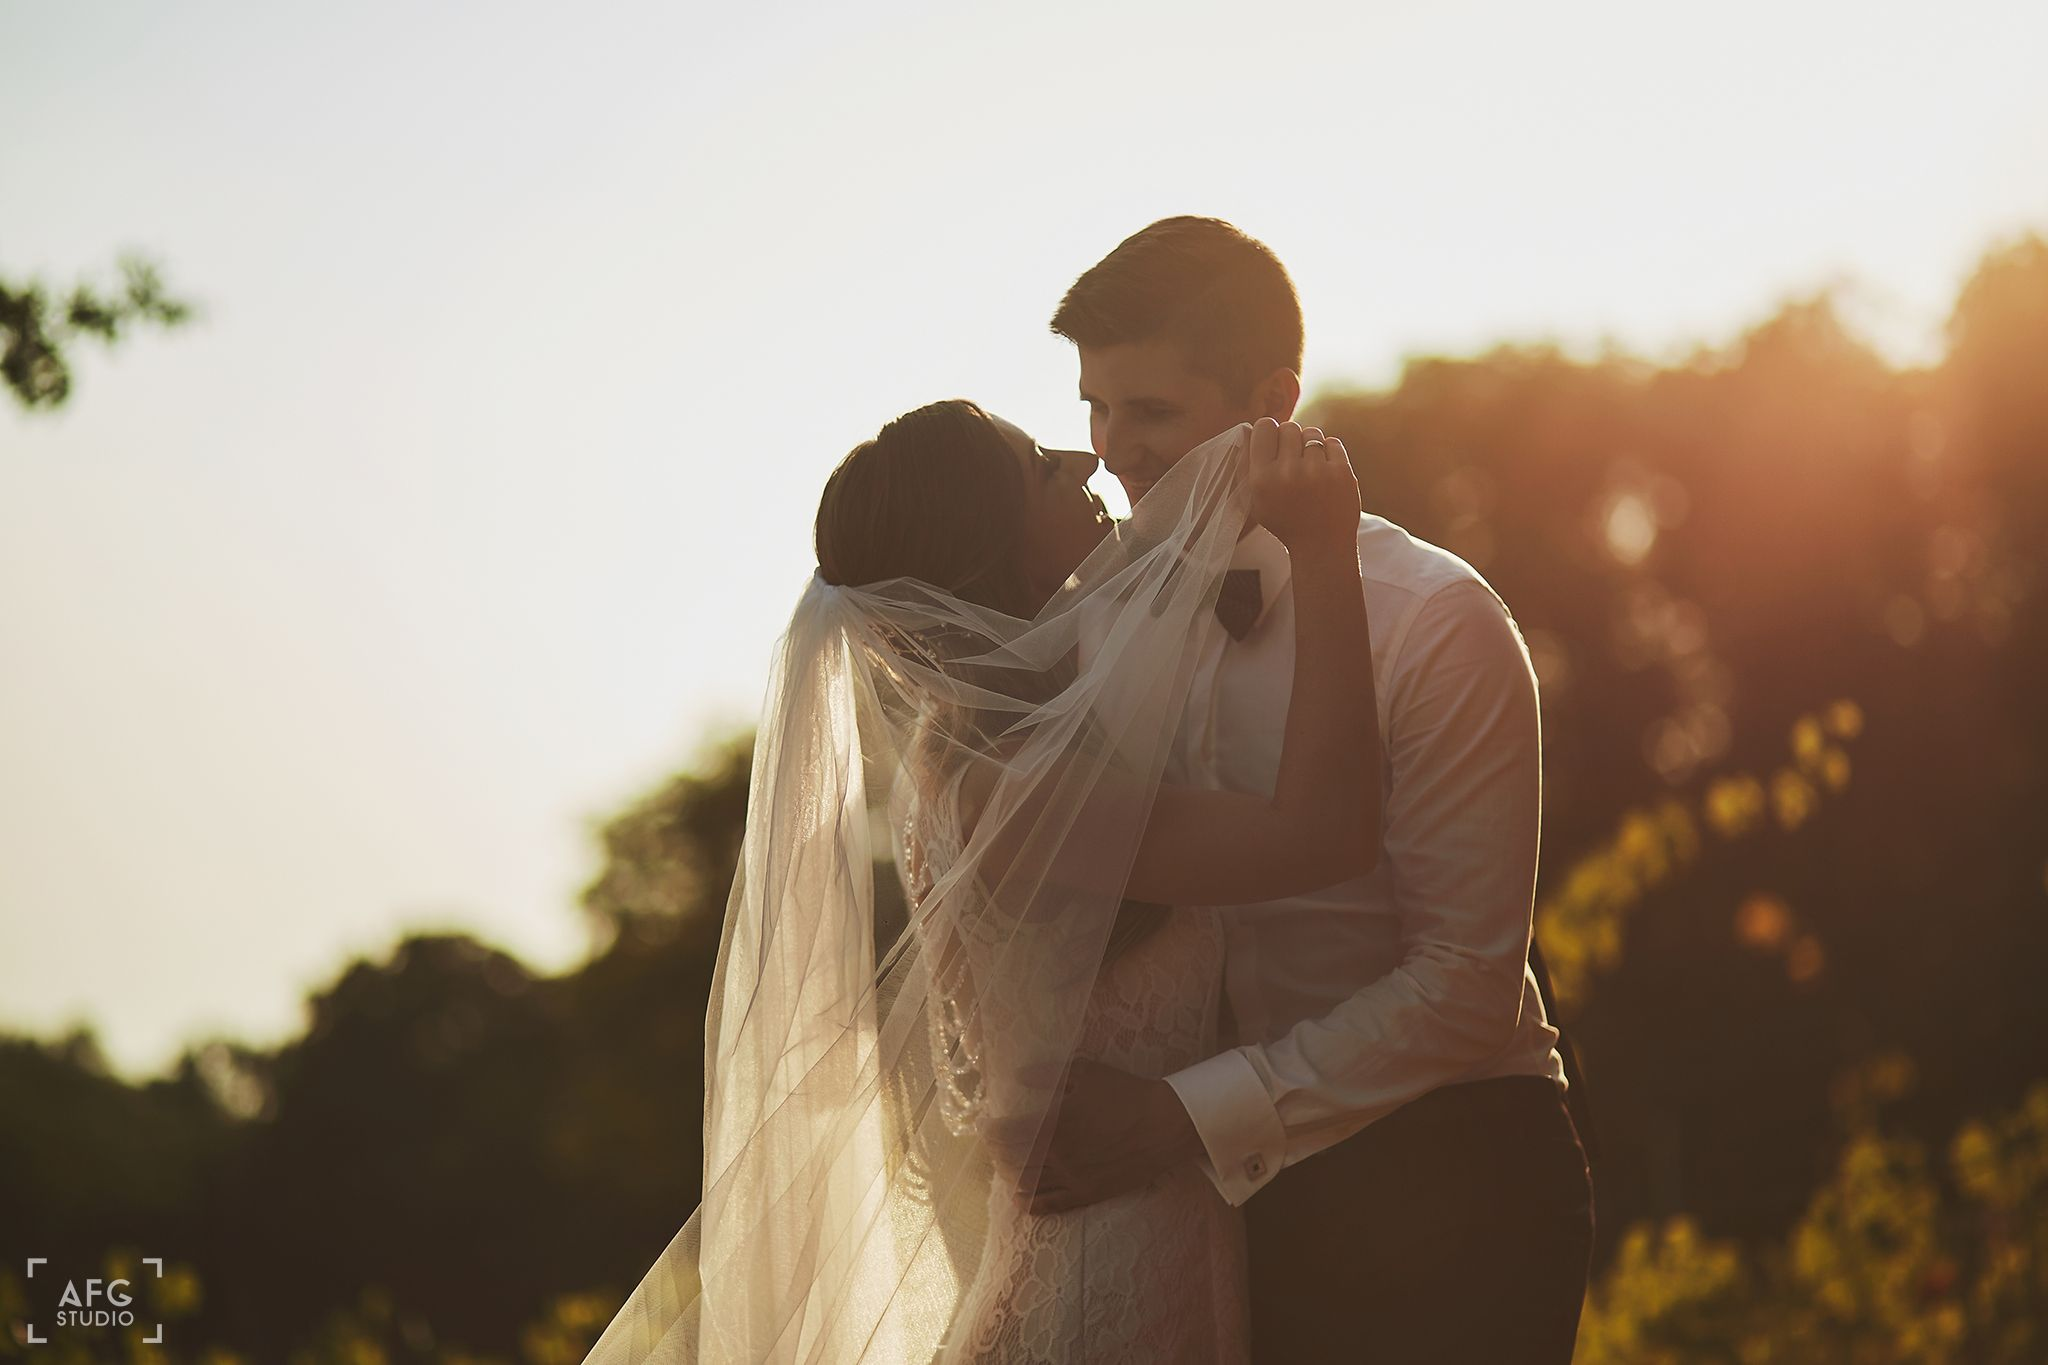 welon, mąż, żona, suknia ślubna